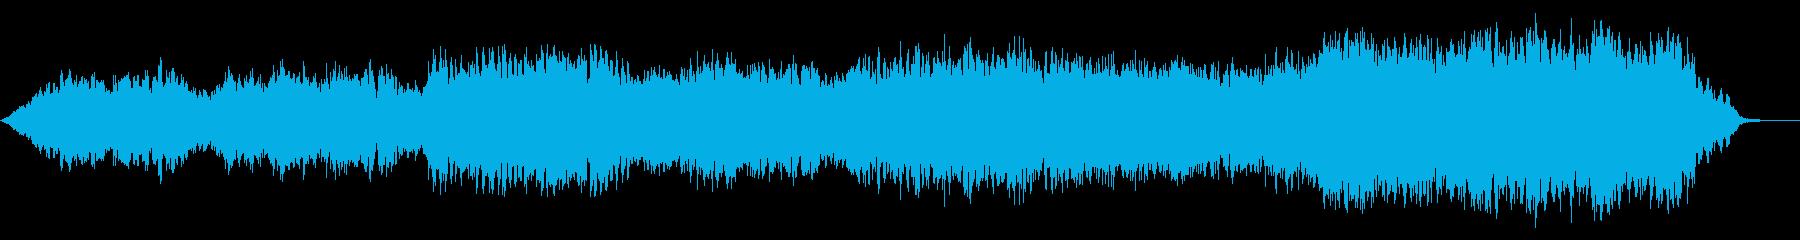 SFテクスチャー9 浮遊感 神秘・幻想 の再生済みの波形